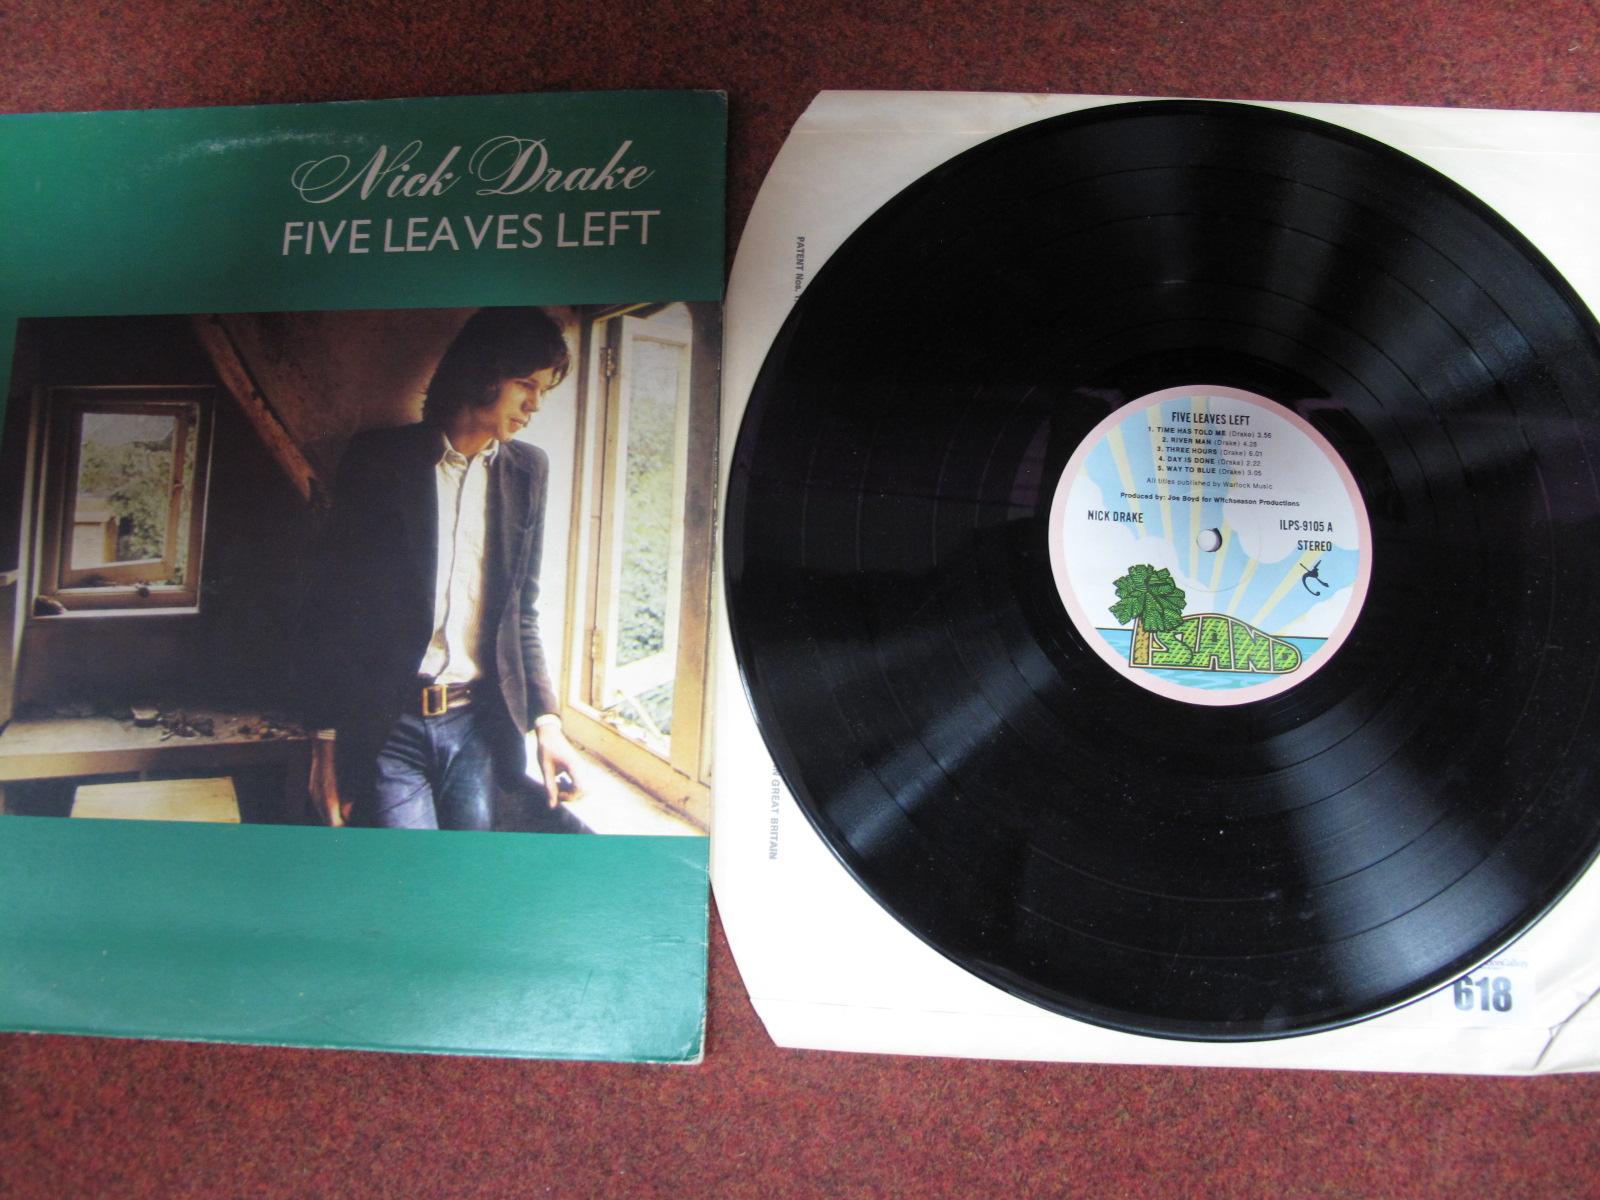 Lot 618 - Nick Drake 'Five Leaves Left' LP, early 70's Island Pink Rim pressing, A-3U/B-3U matrix endings,